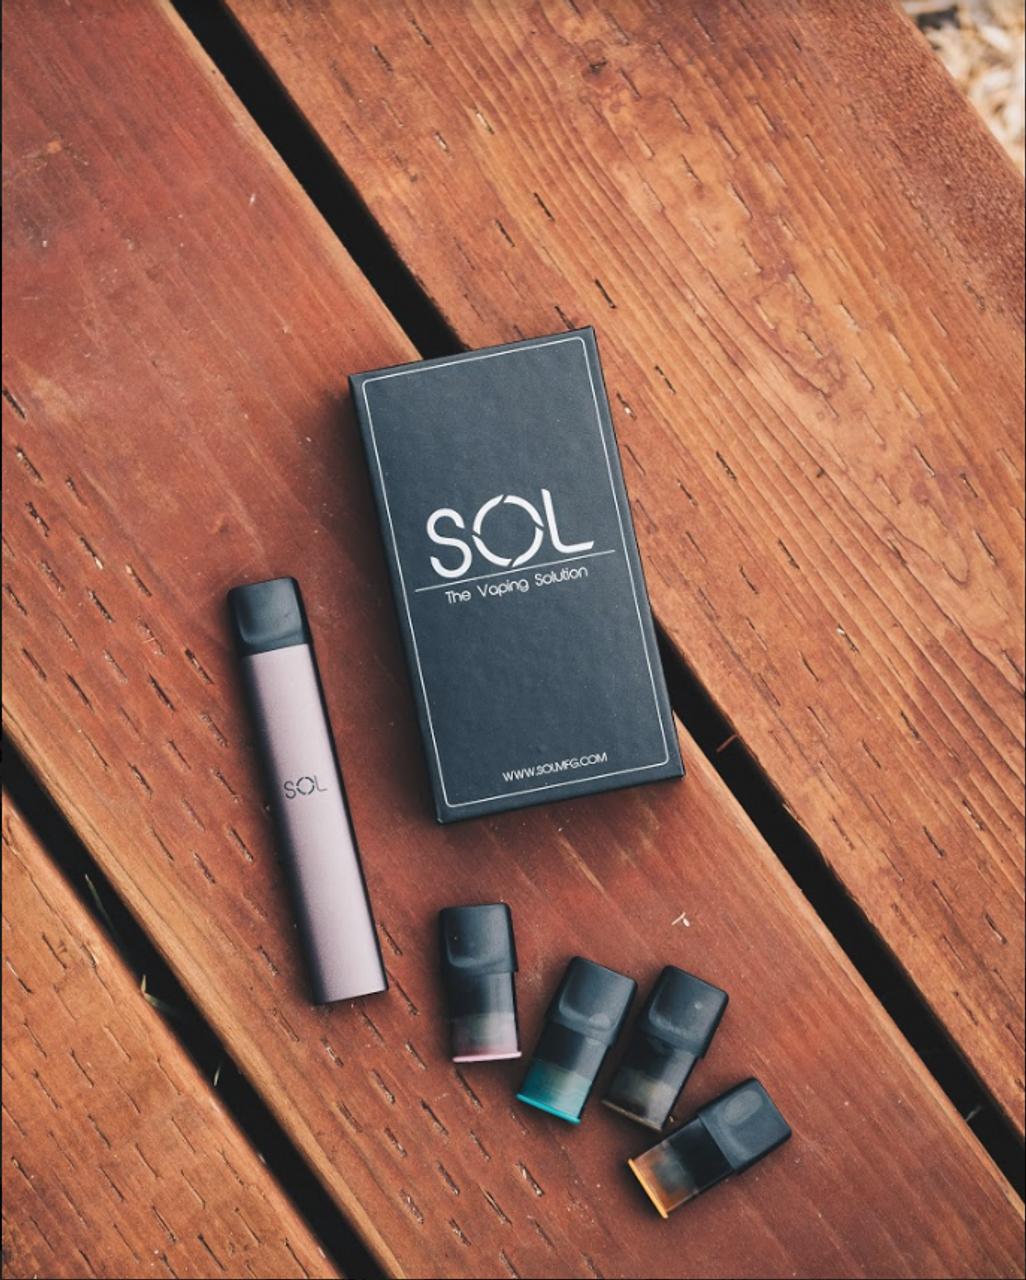 SOL Vape Pen | Portable Pod System Device